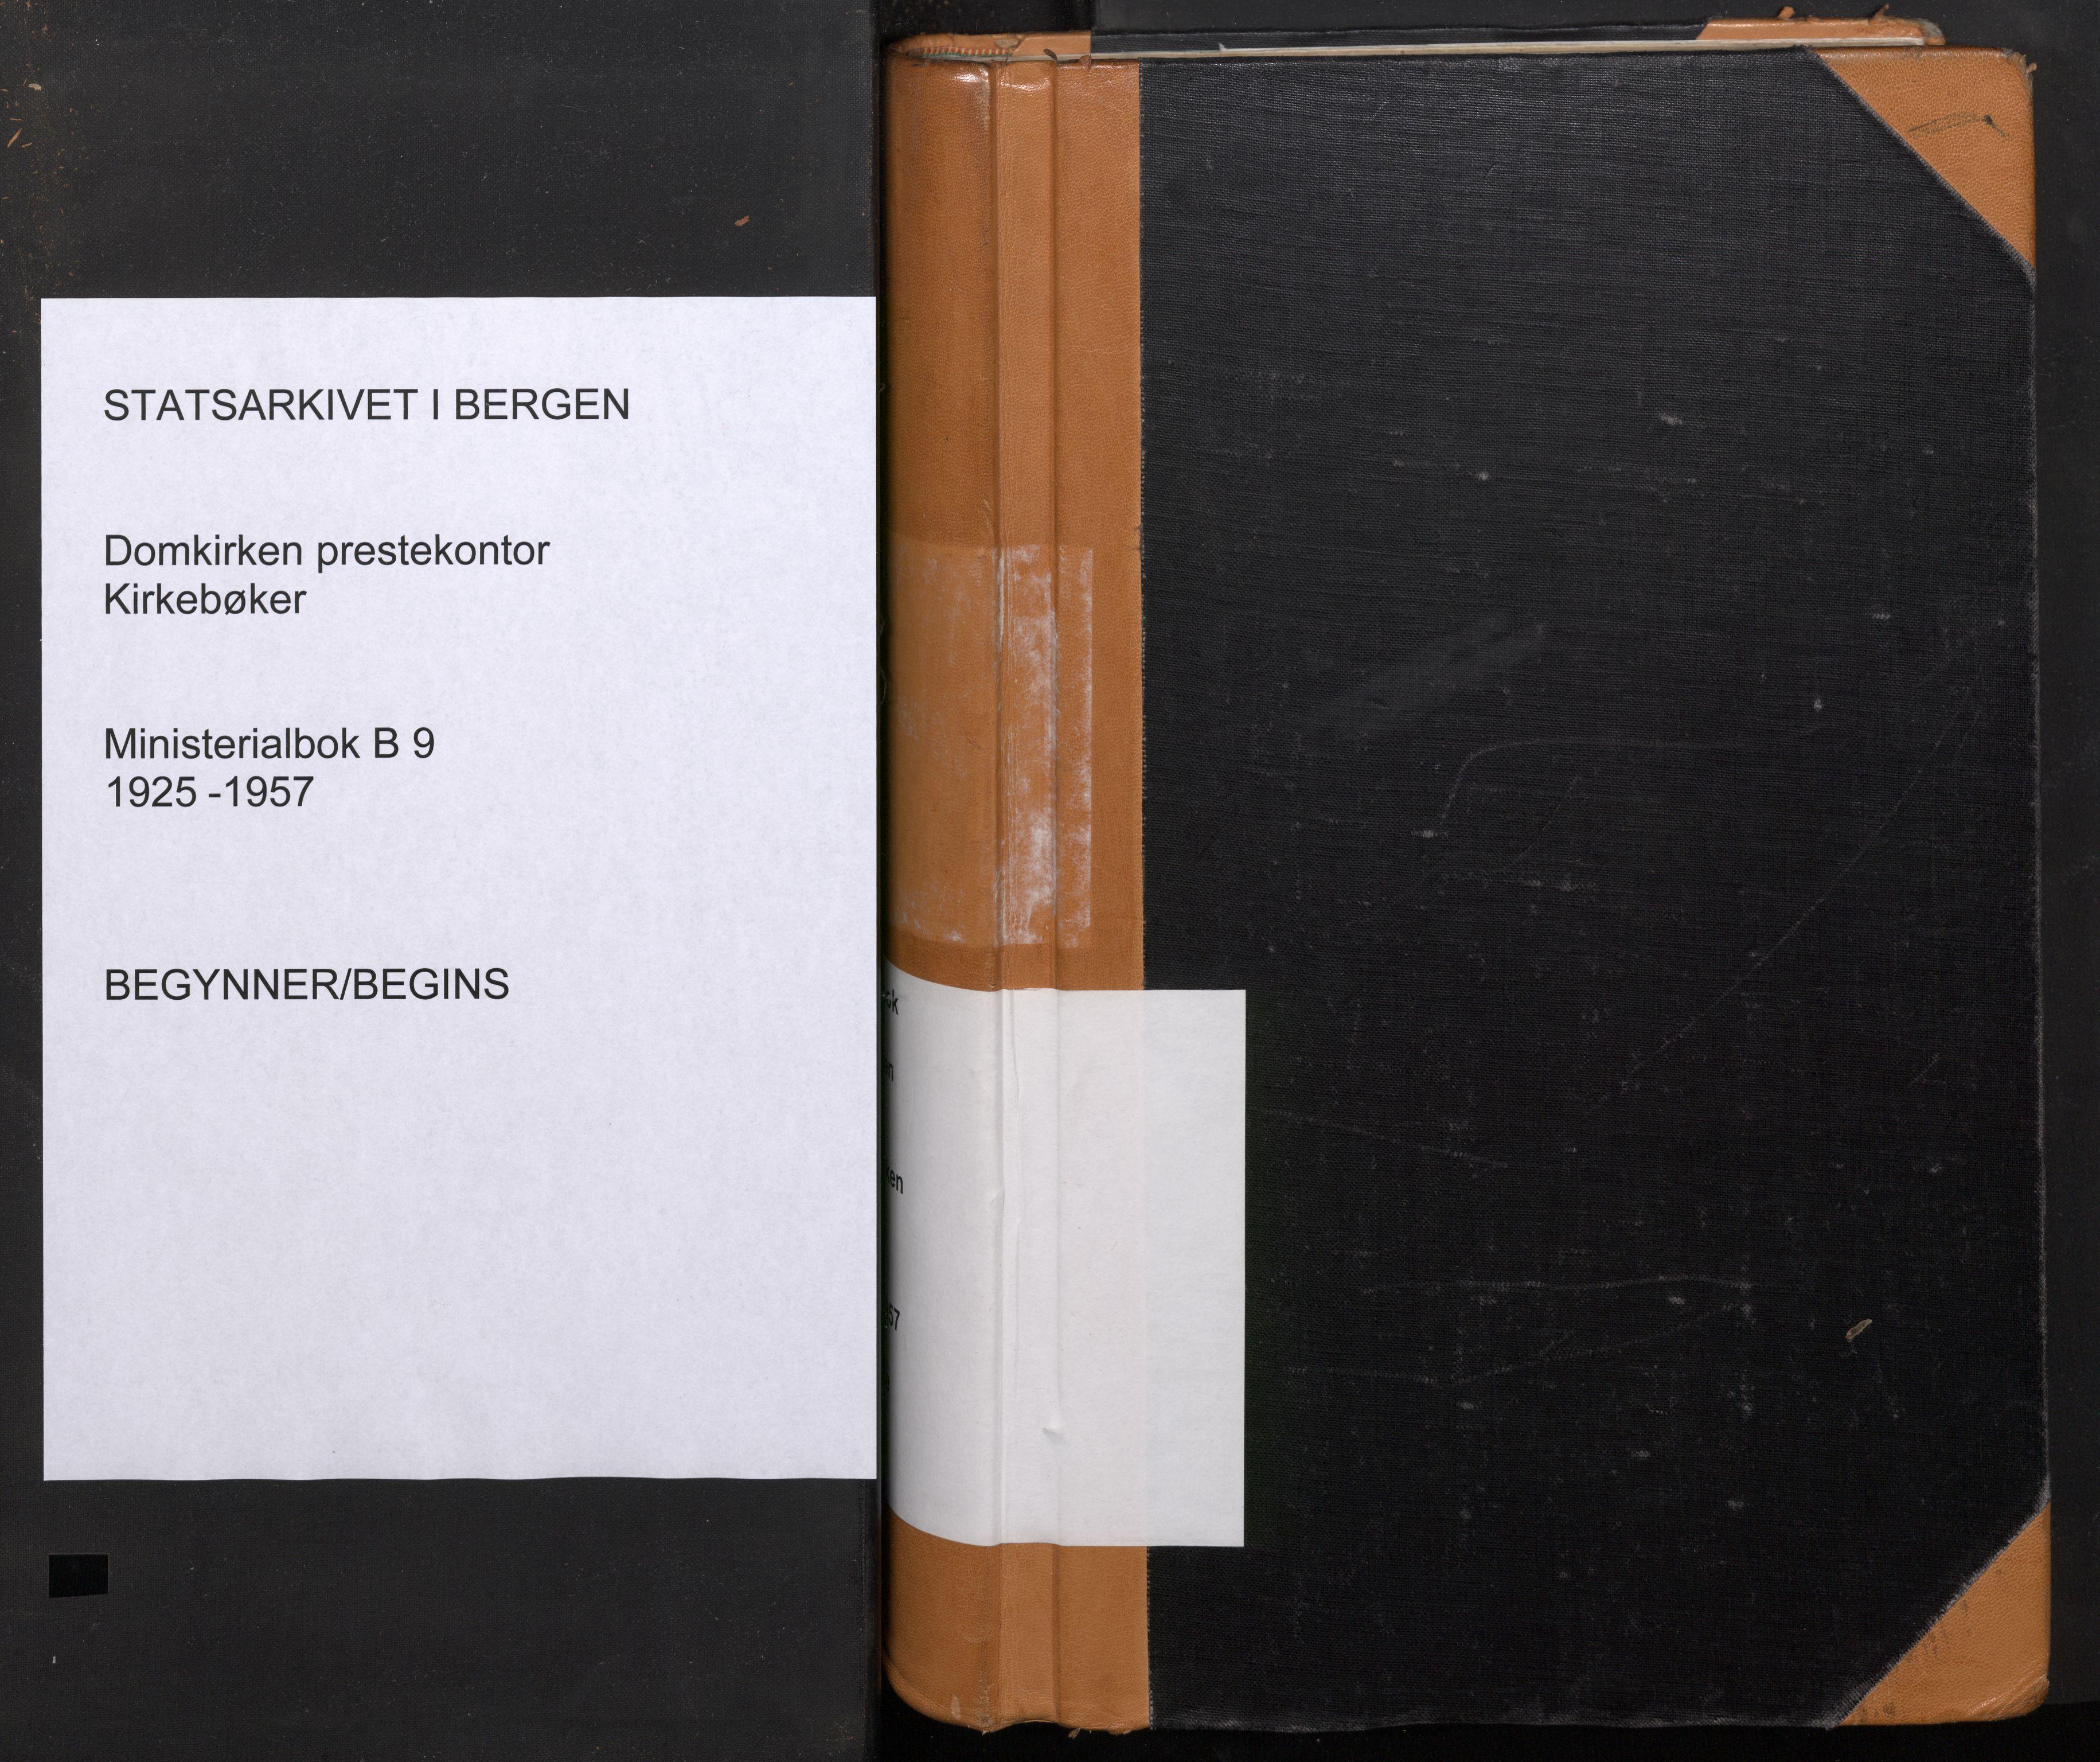 SAB, Domkirken Sokneprestembete, H/Haa: Ministerialbok nr. B 9, 1925-1957